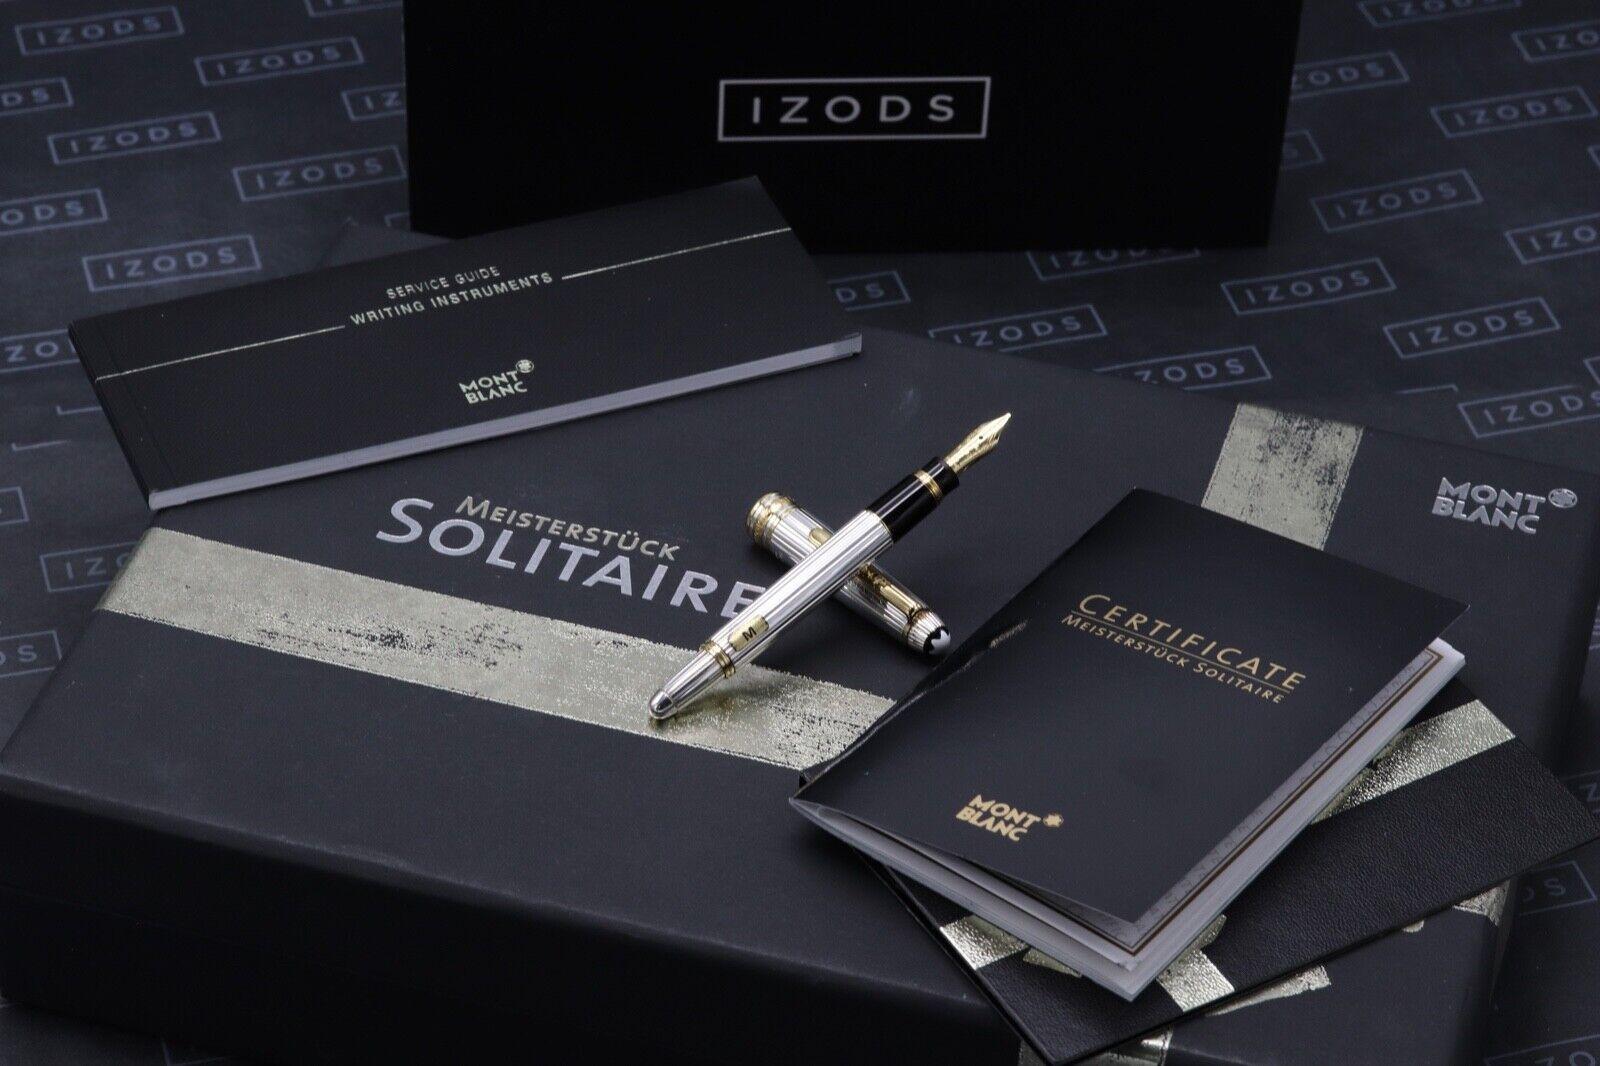 Montblanc Meisterstuck 114 Mozart AG925 Solitaire Pinstripe Fountain Pen